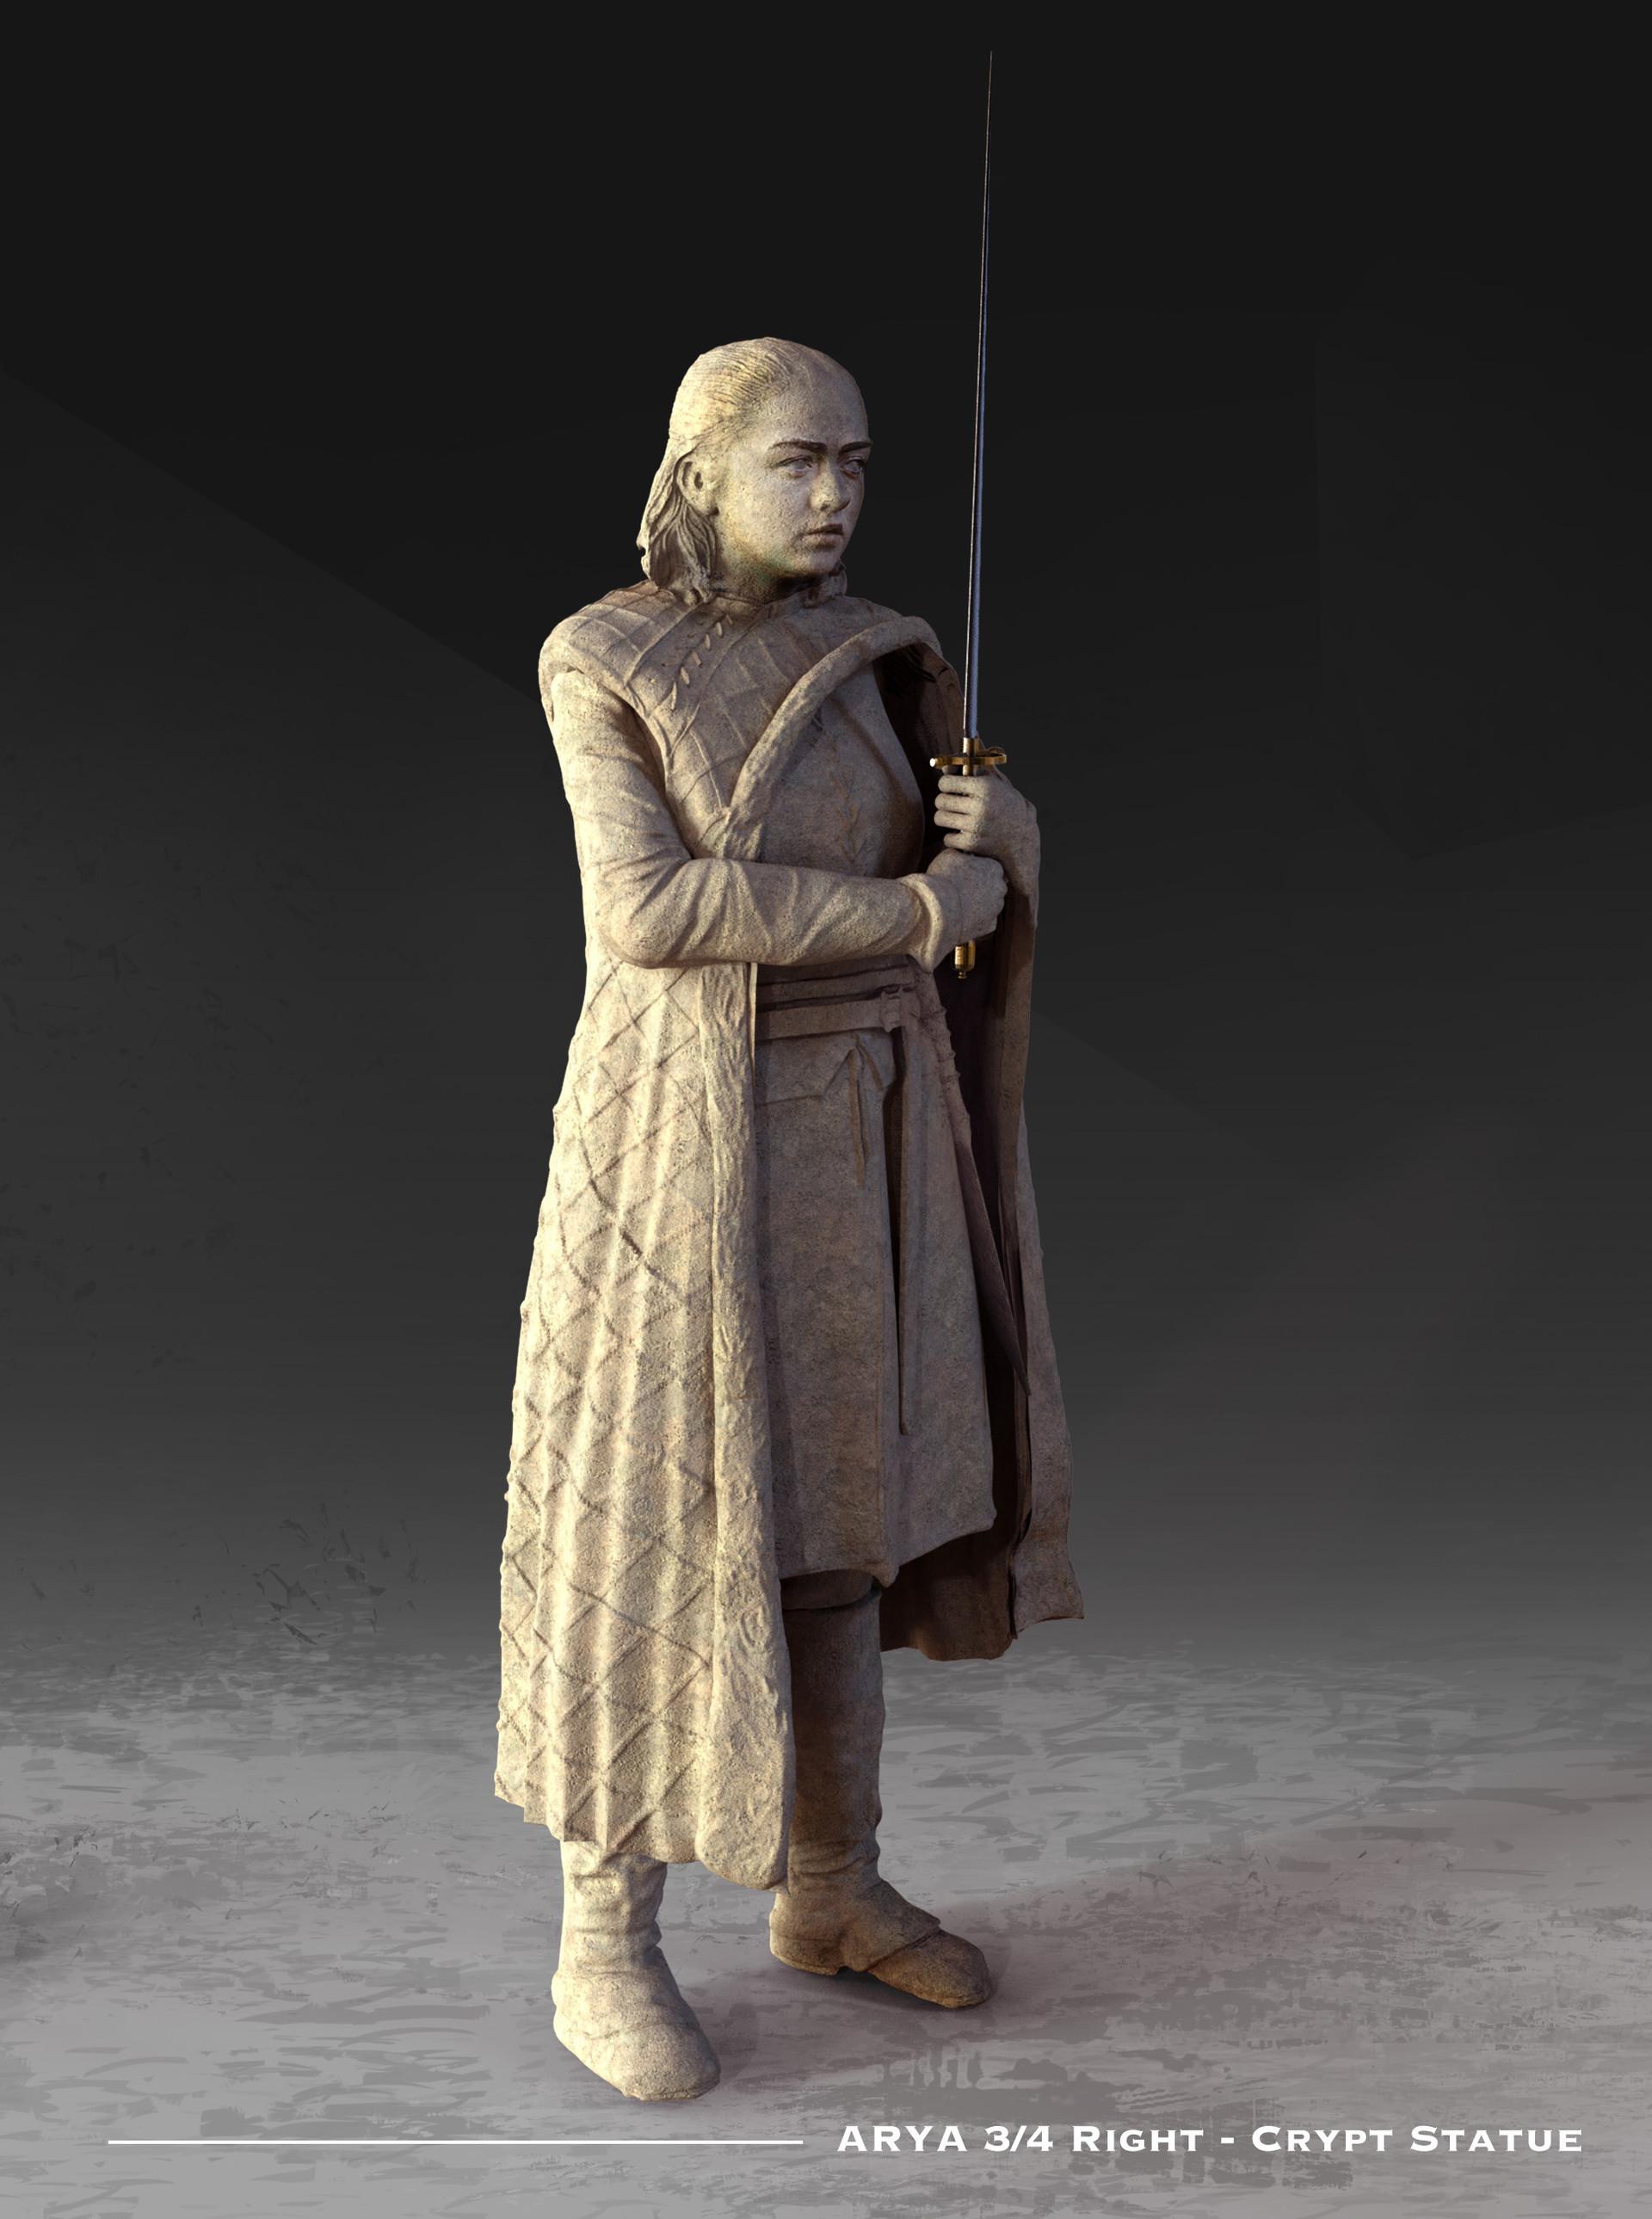 Kieran belshaw arya statue 3quarterright v002